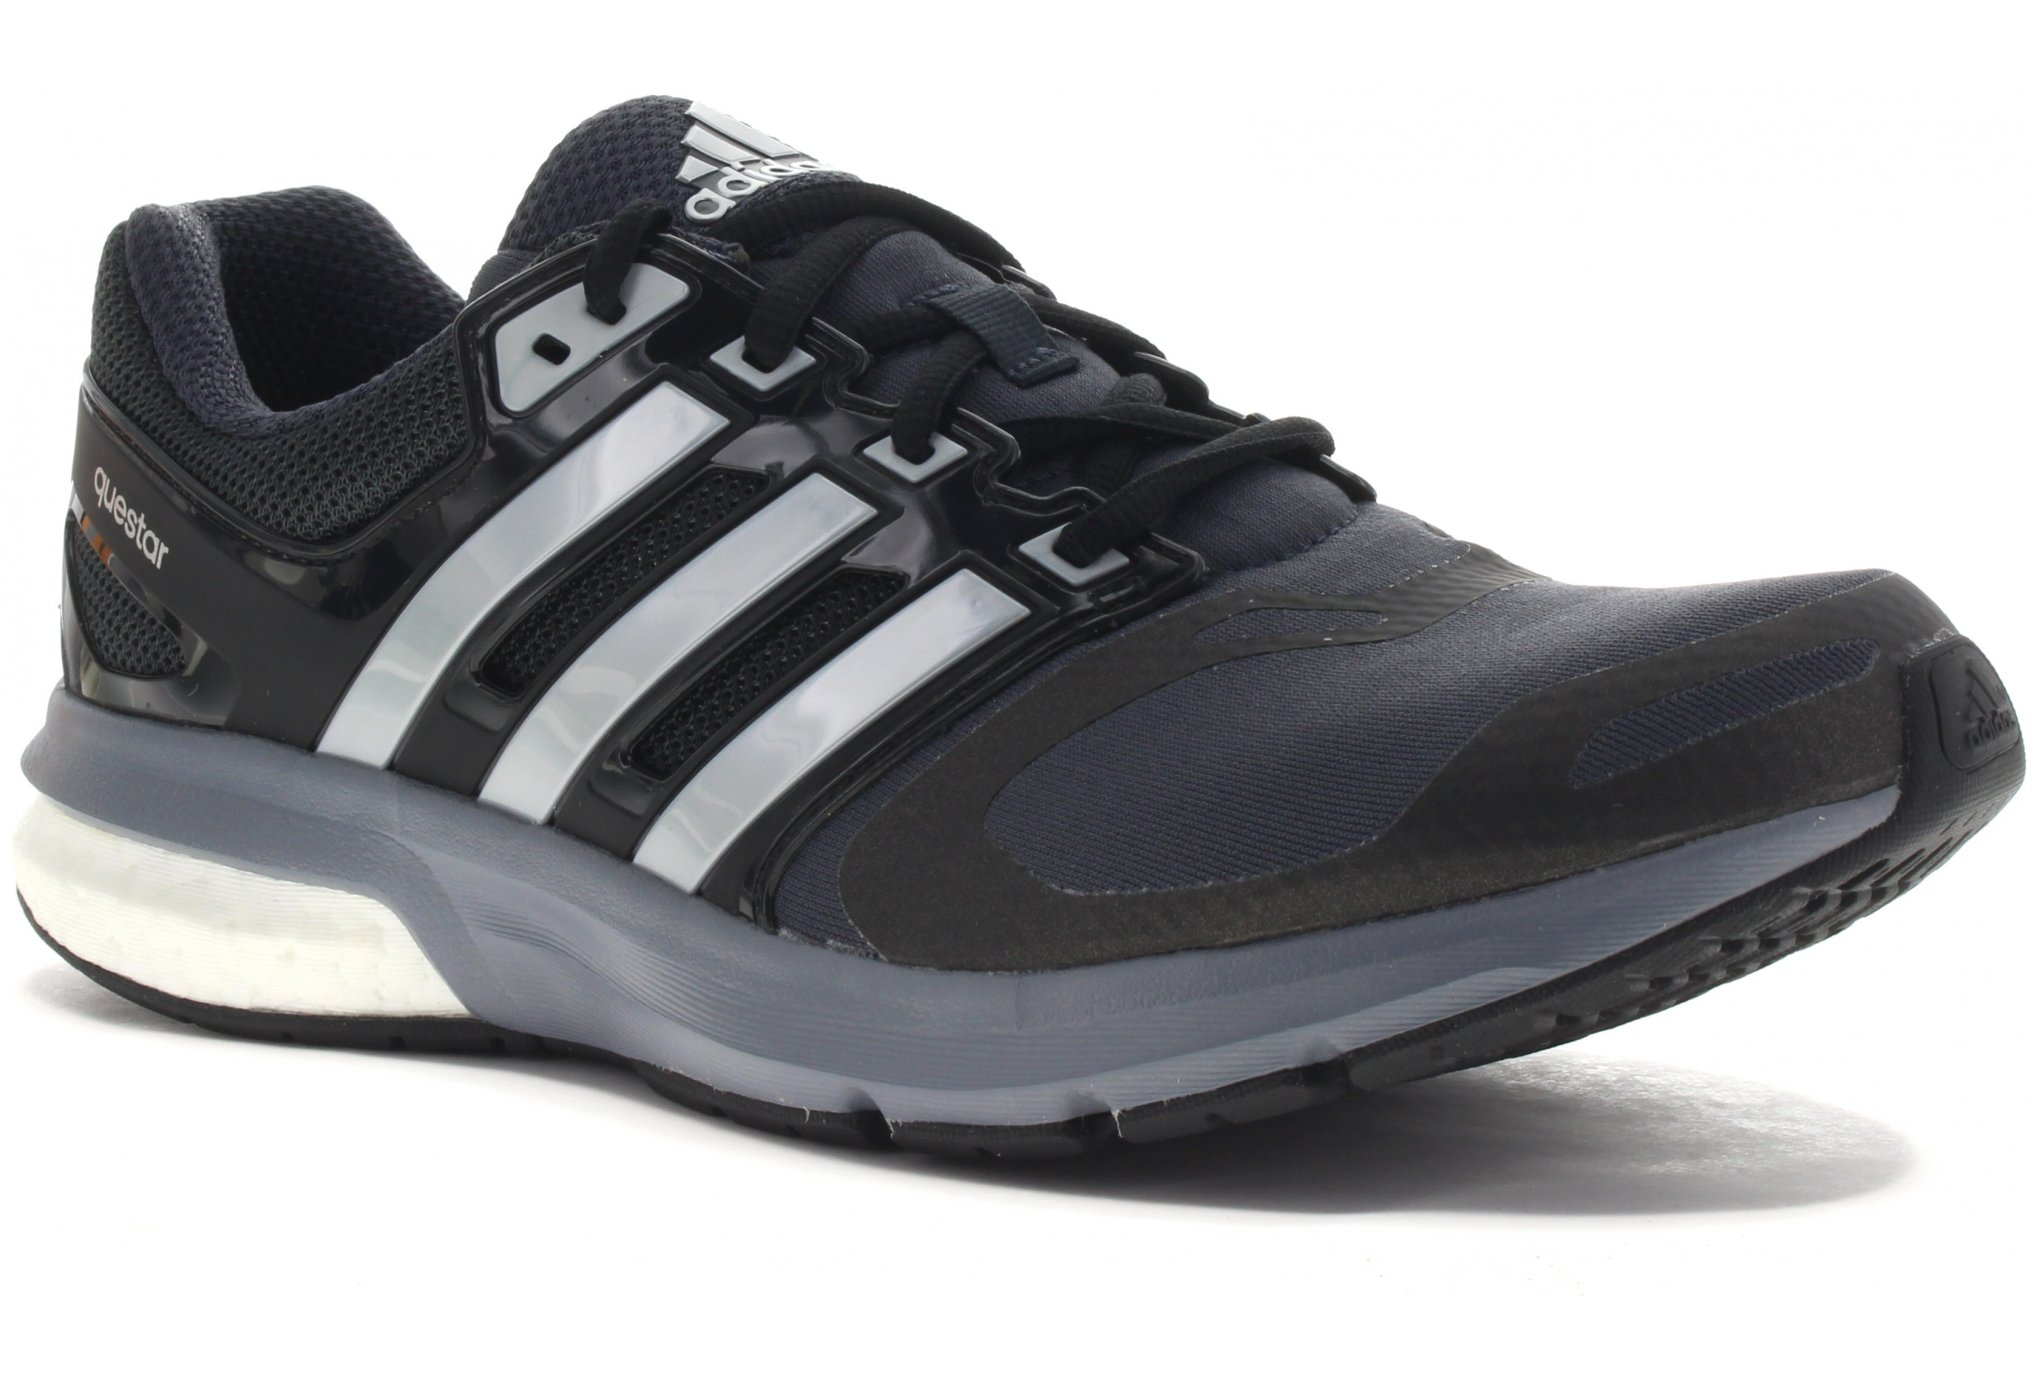 Adidas Questar boost techfit w diététique chaussures femme